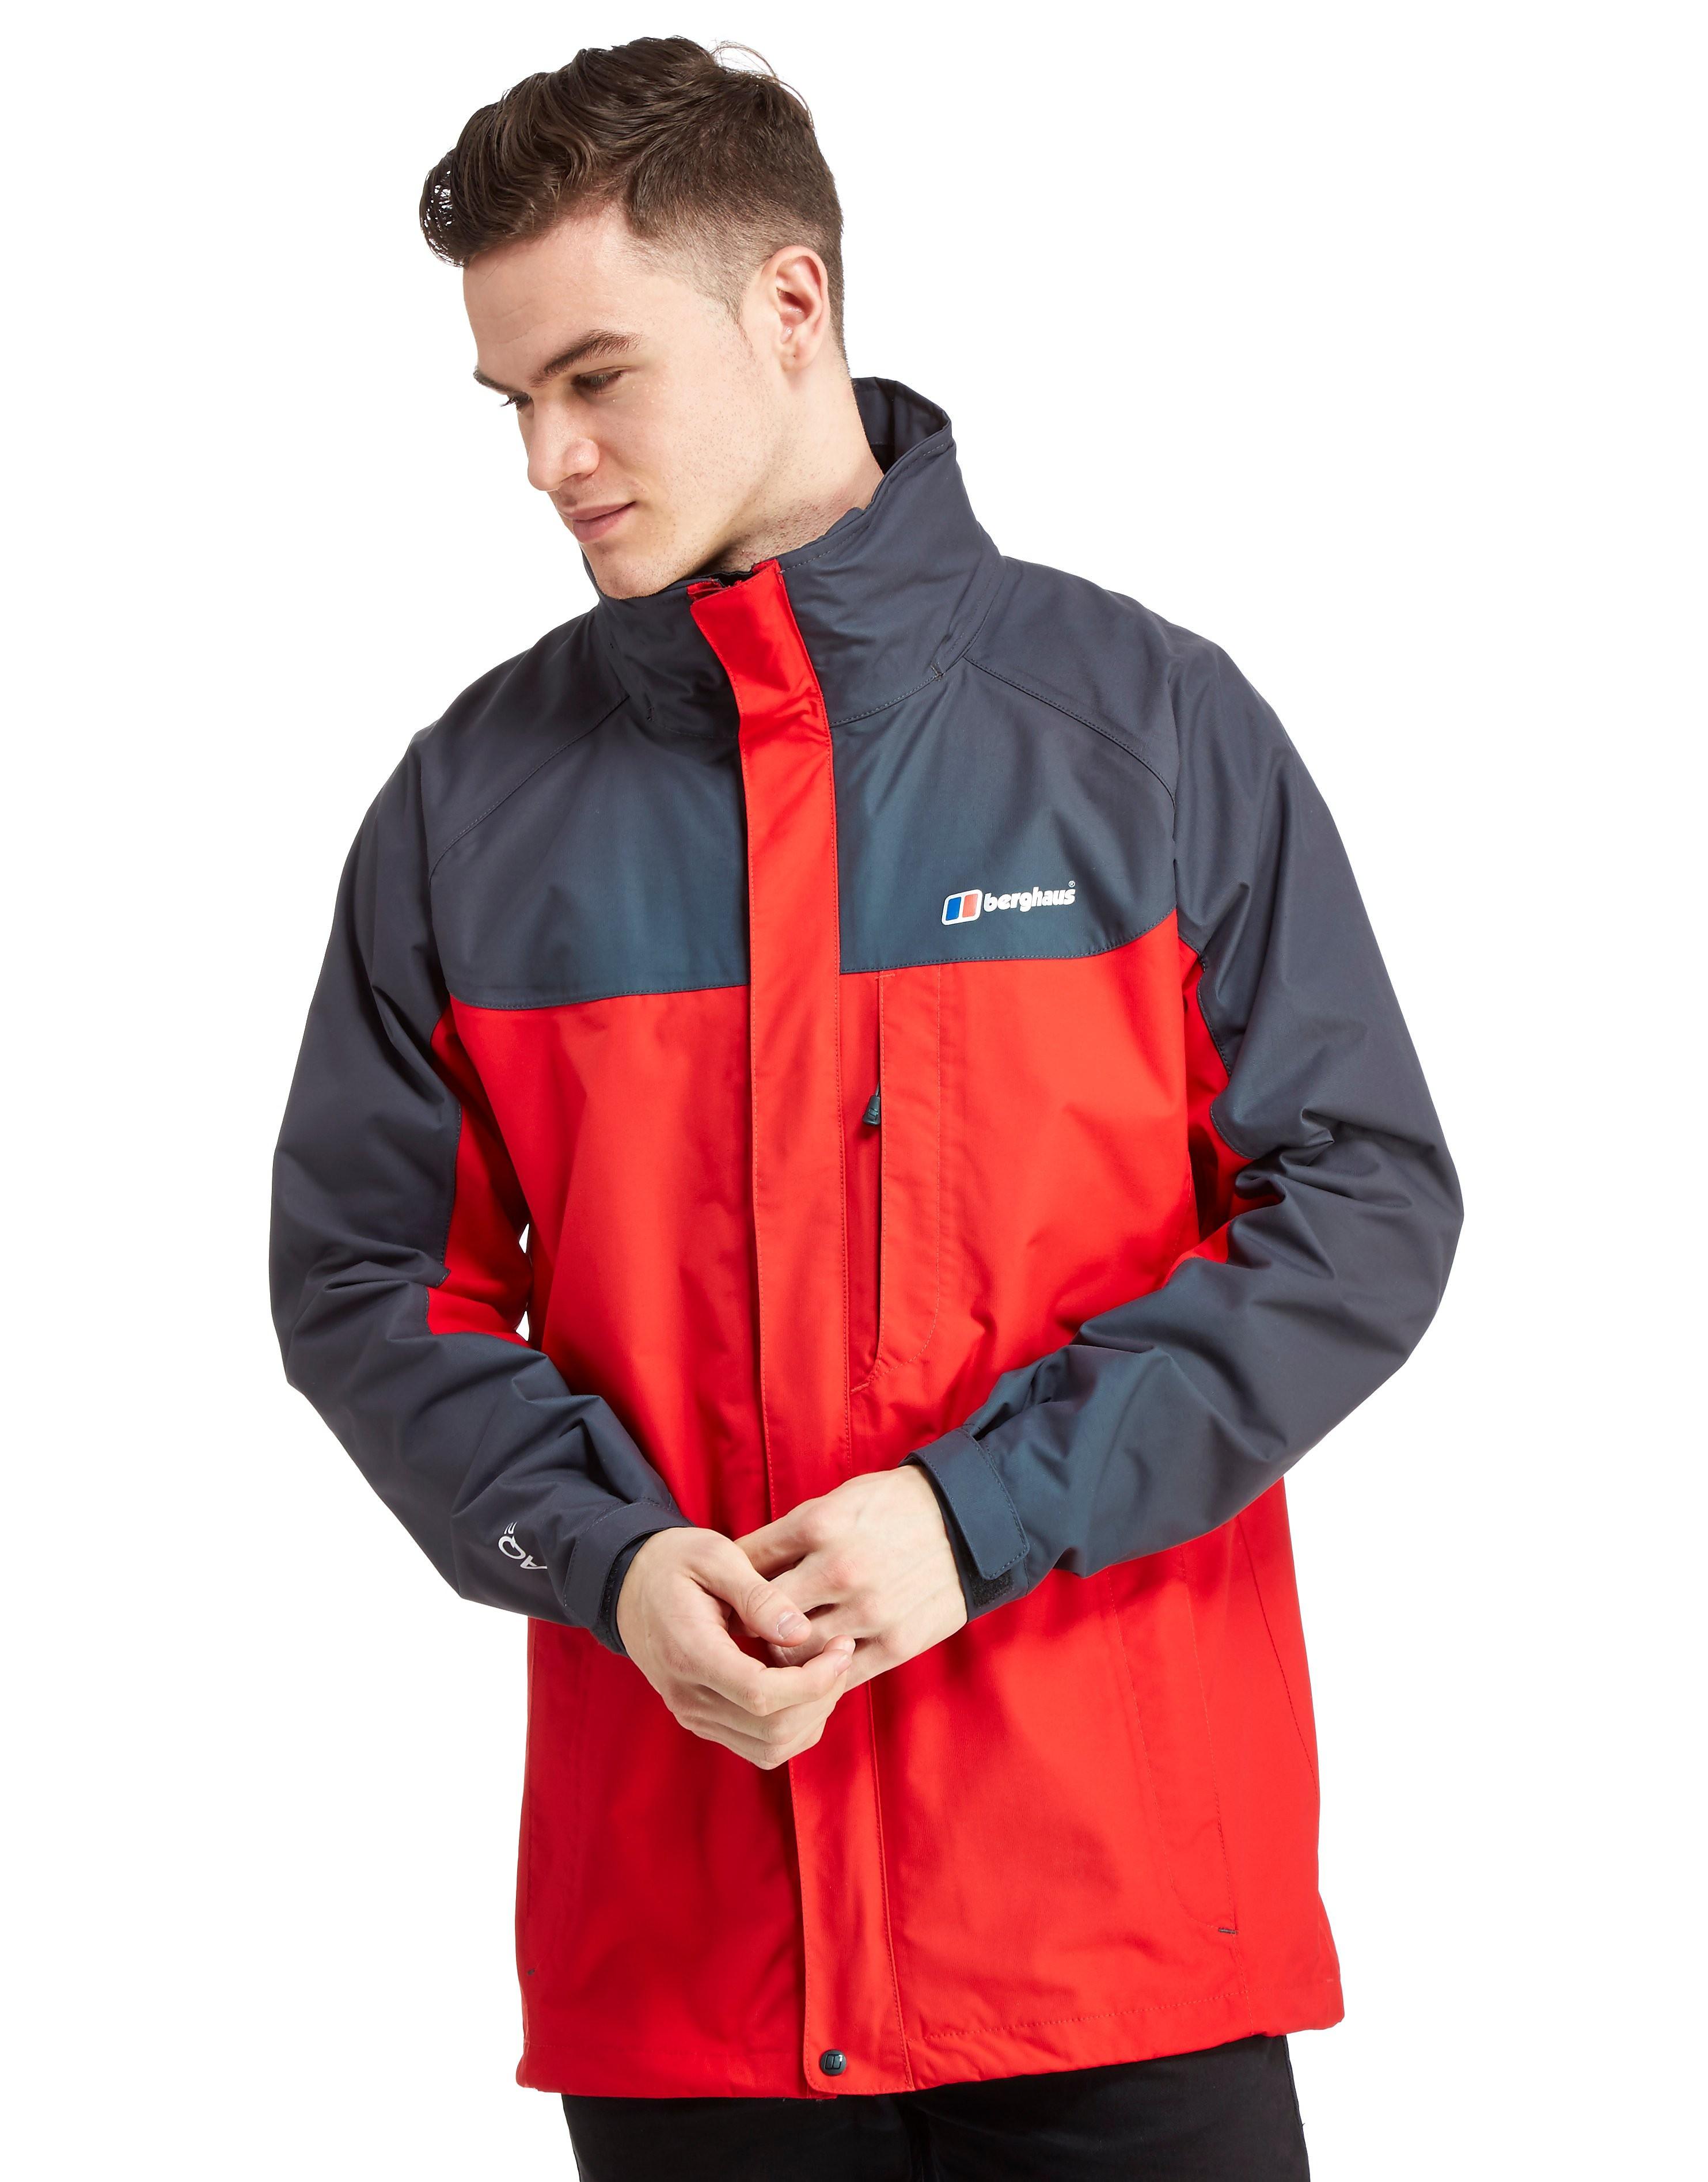 Berghaus Gamma Long Waterproof Jacket